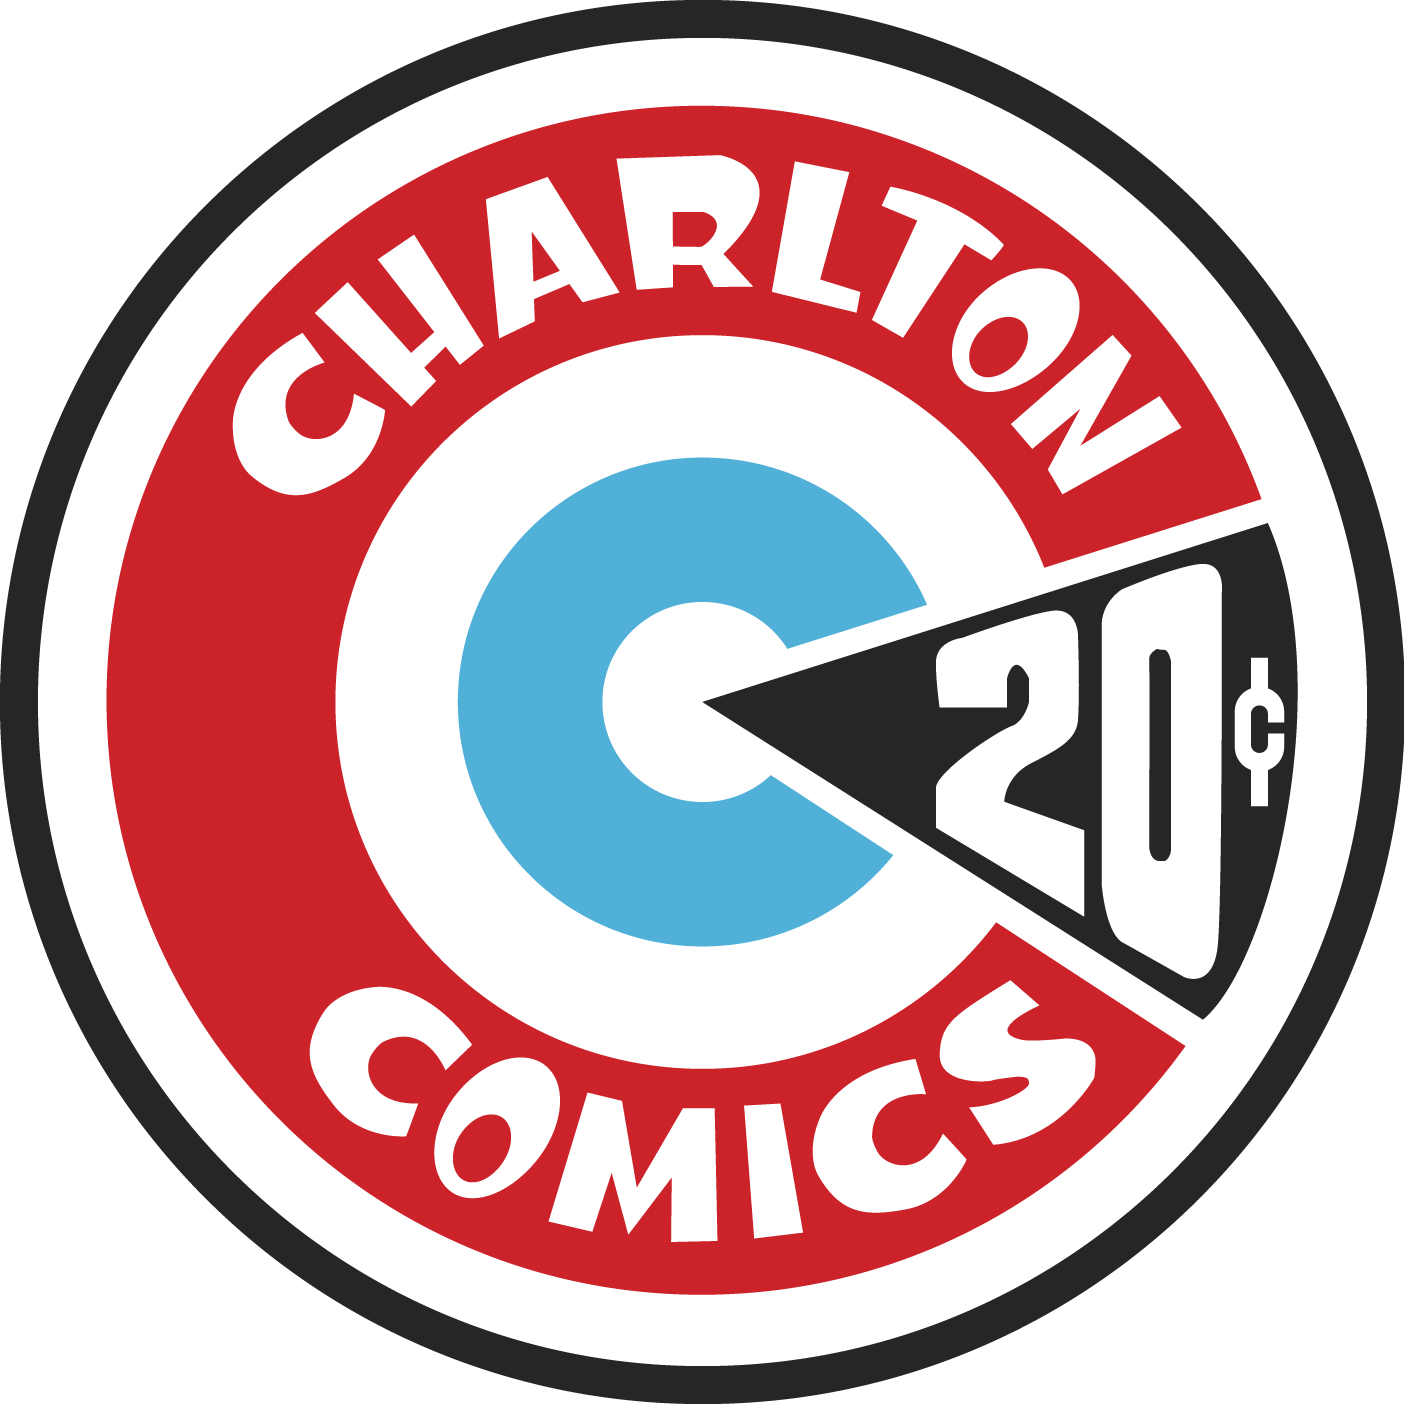 how to create a comic book company